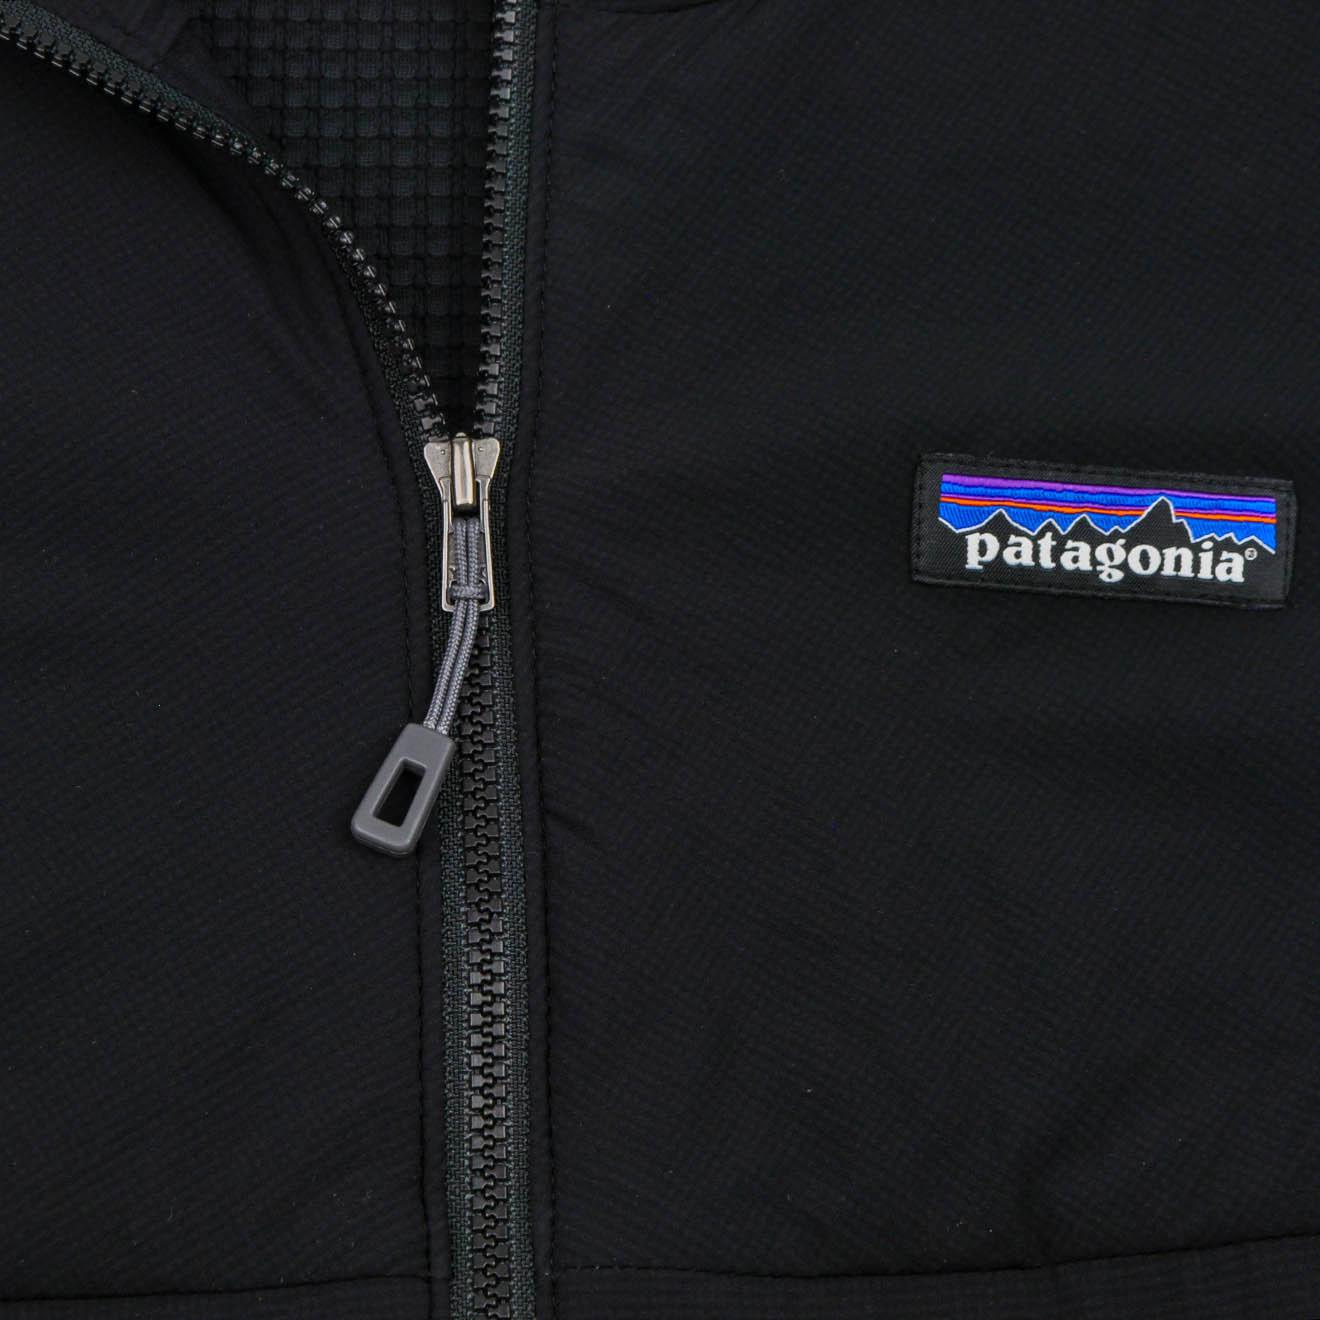 85e2b051d4 Patagonia Nano-Air Light Hybrid Hoody Black - The Sporting Lodge